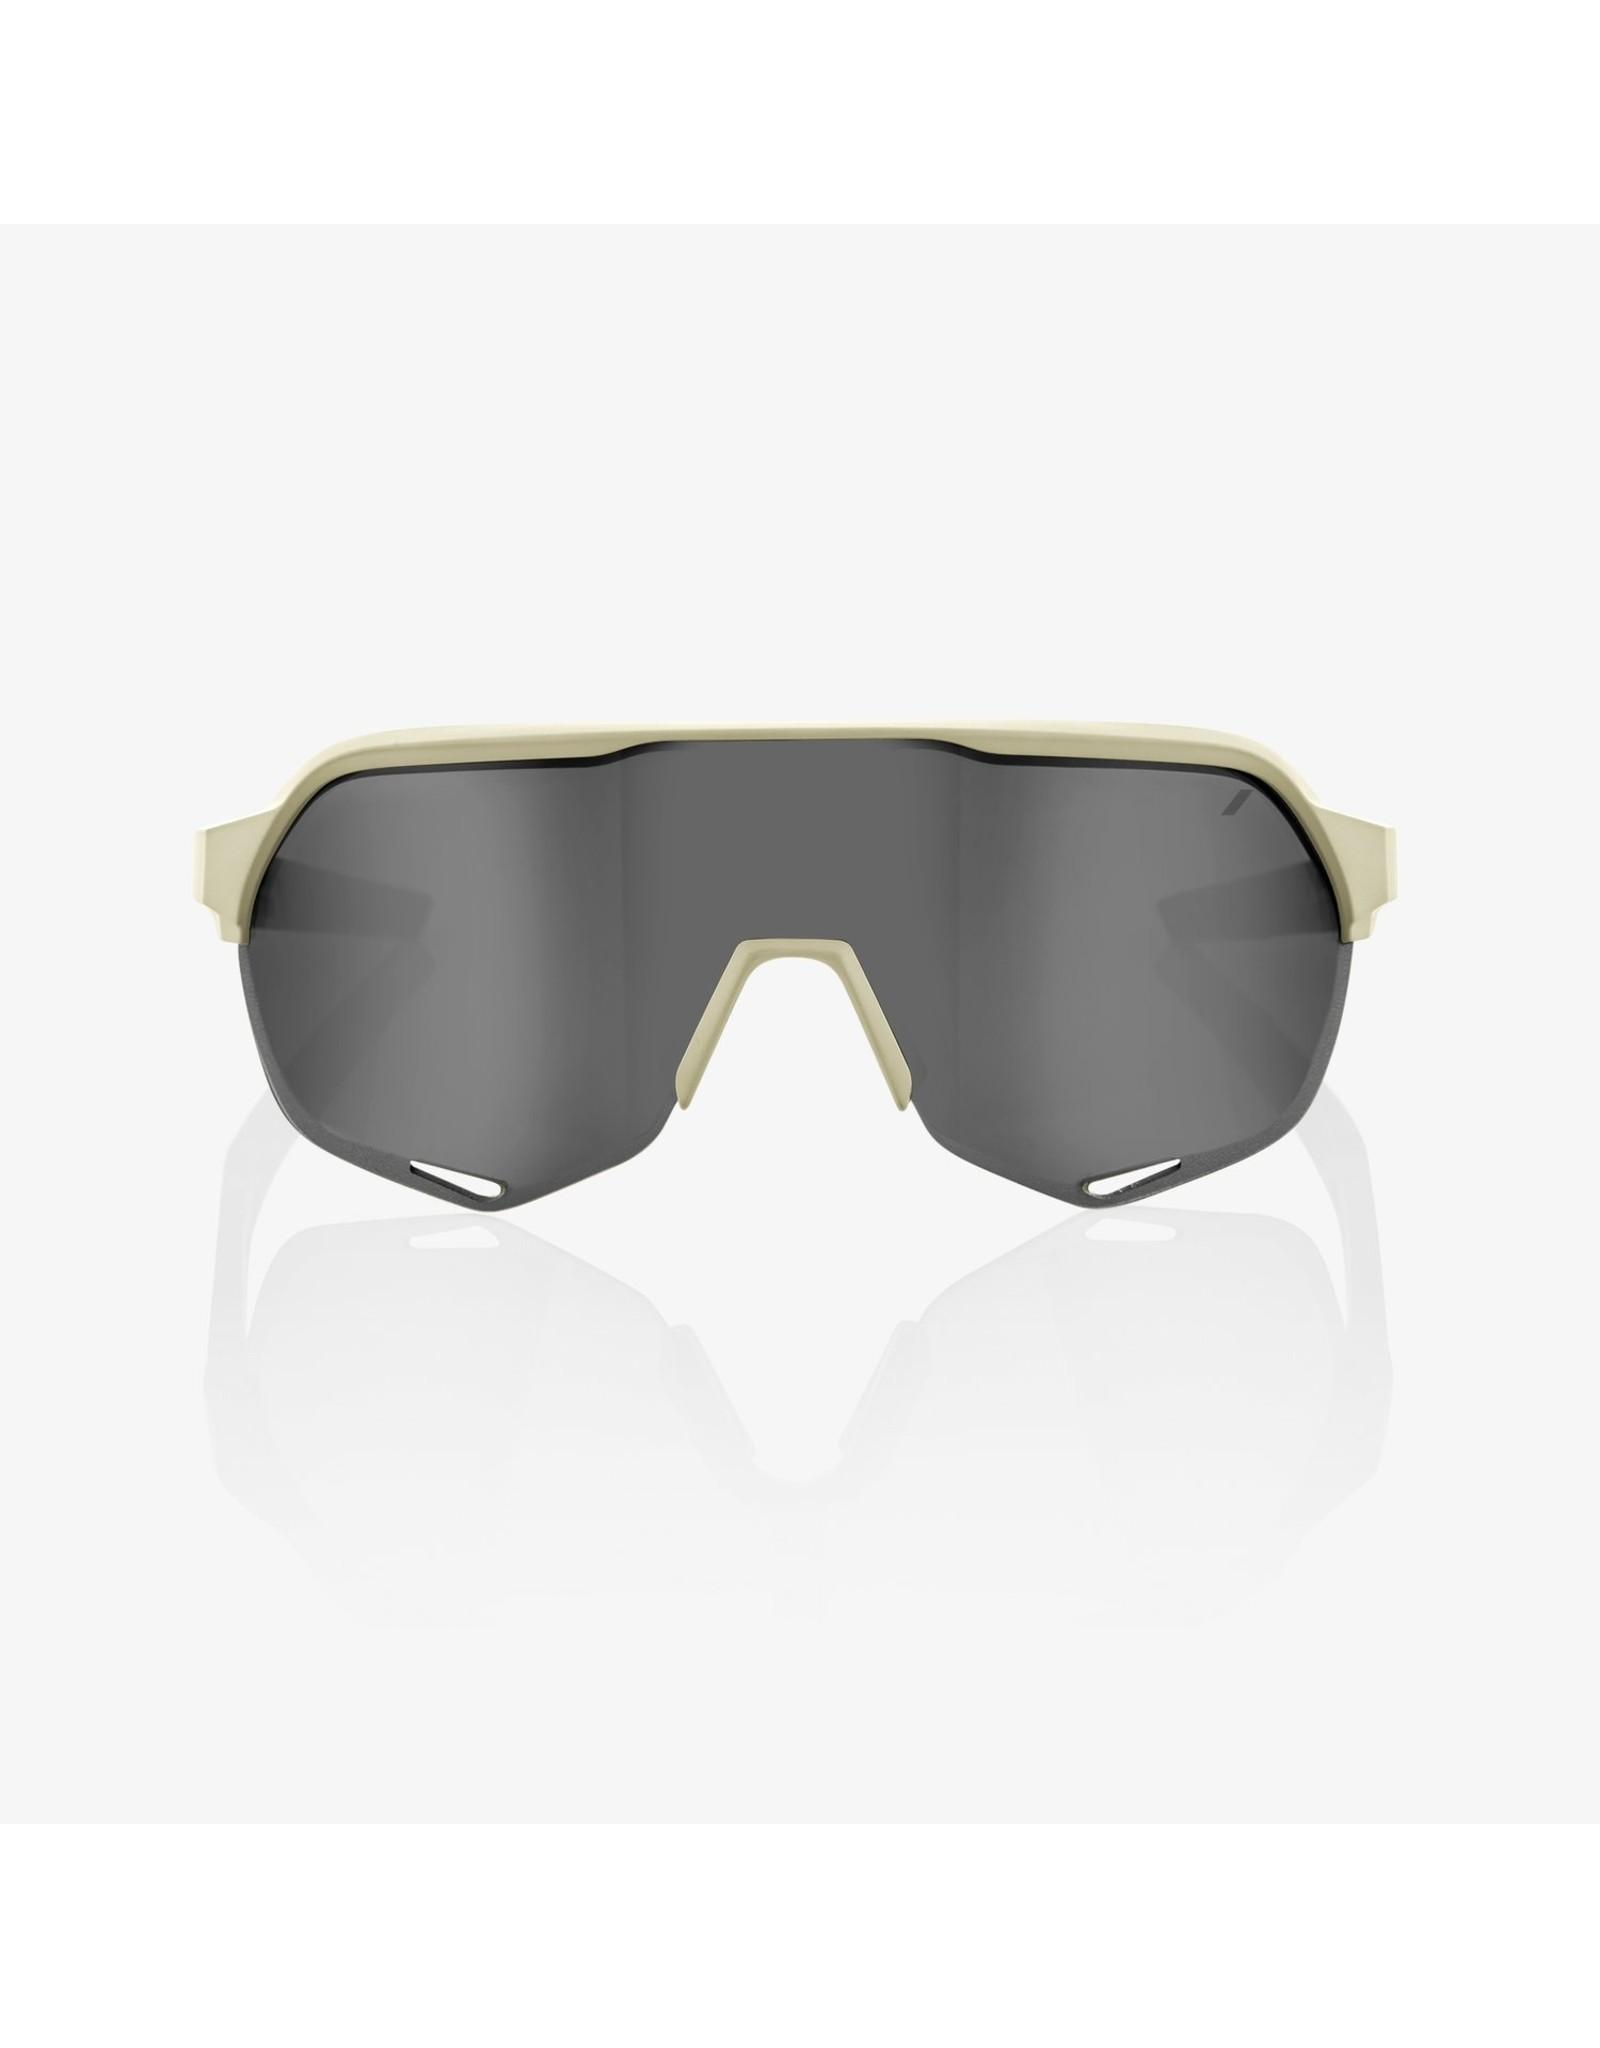 100% 100% S2 Soft Tact Quicksand Smoke Lens